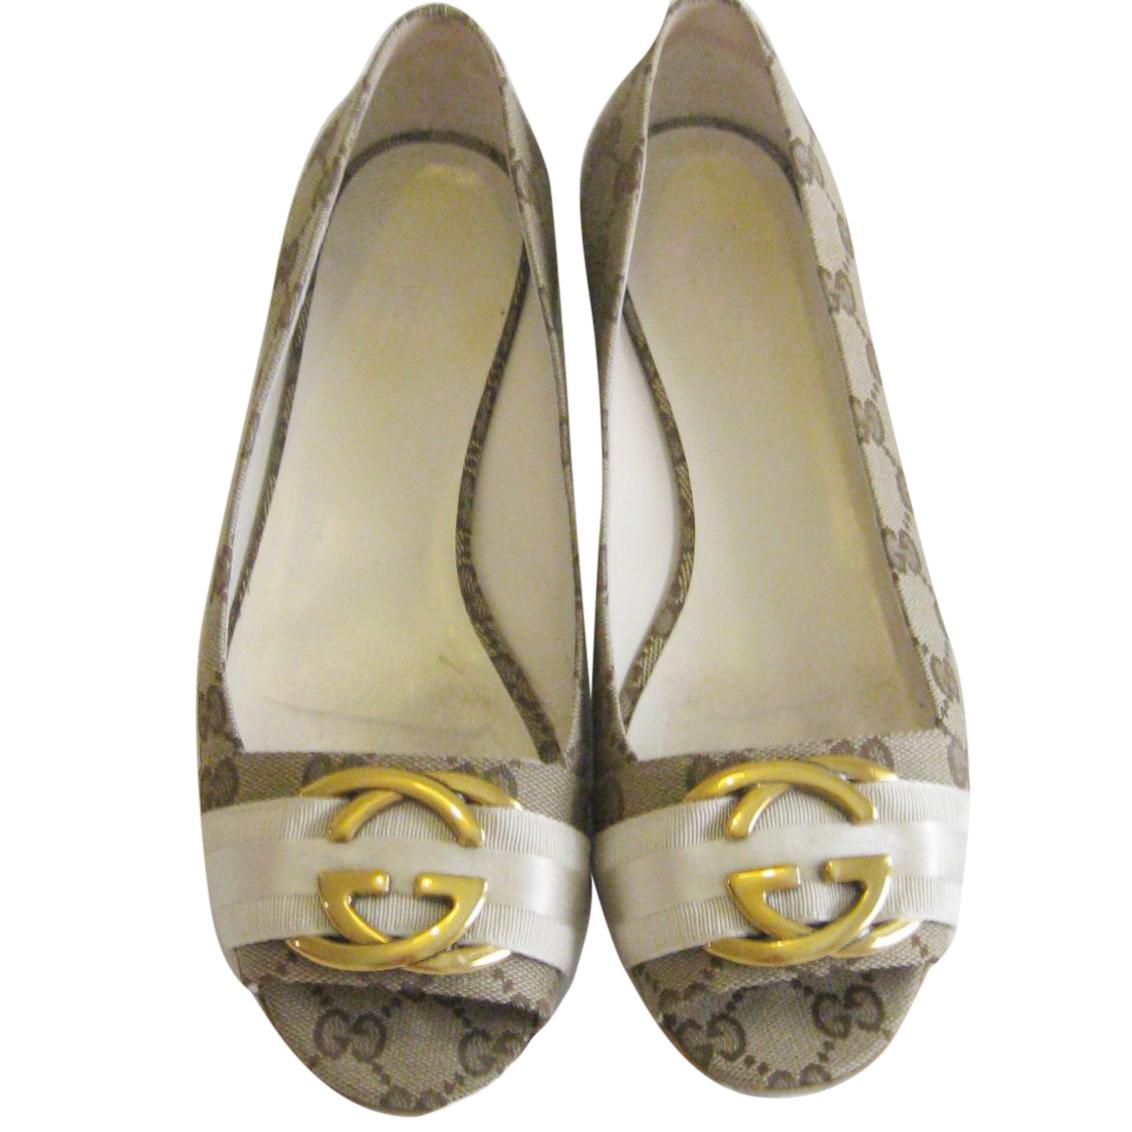 Gucci Monogram Ribbon Peep Toe Ballet Flats